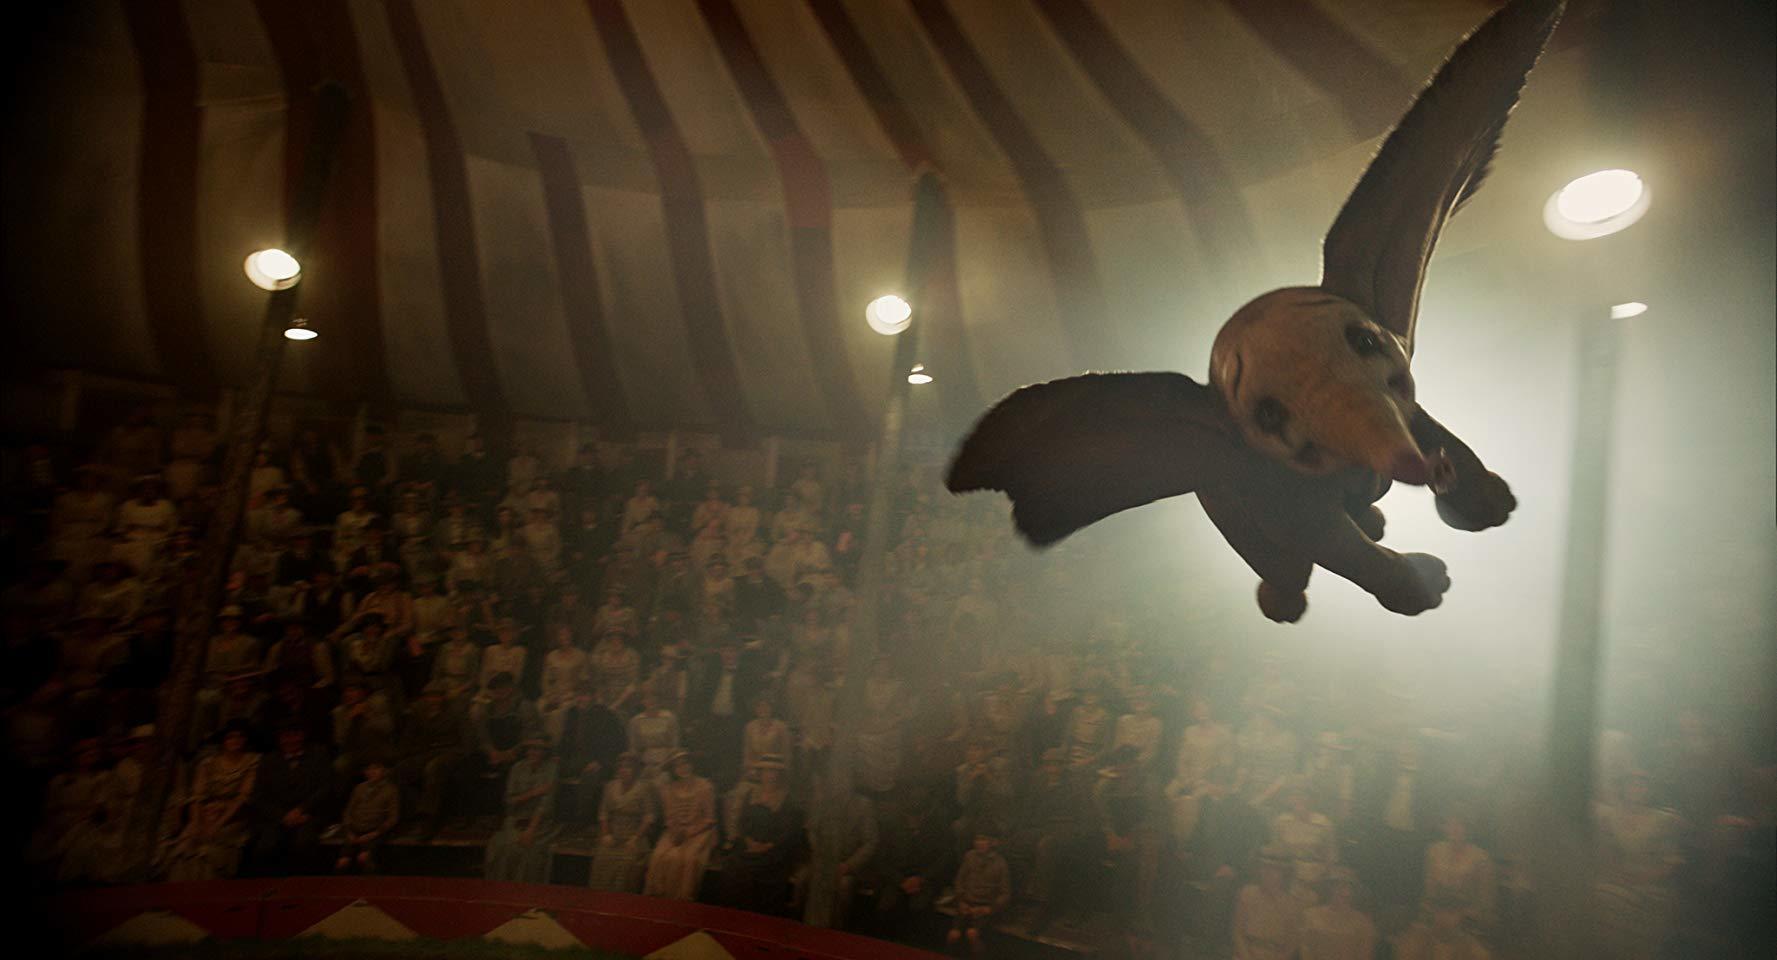 Dumbo2 - KINOFILME AB 28.03.2019